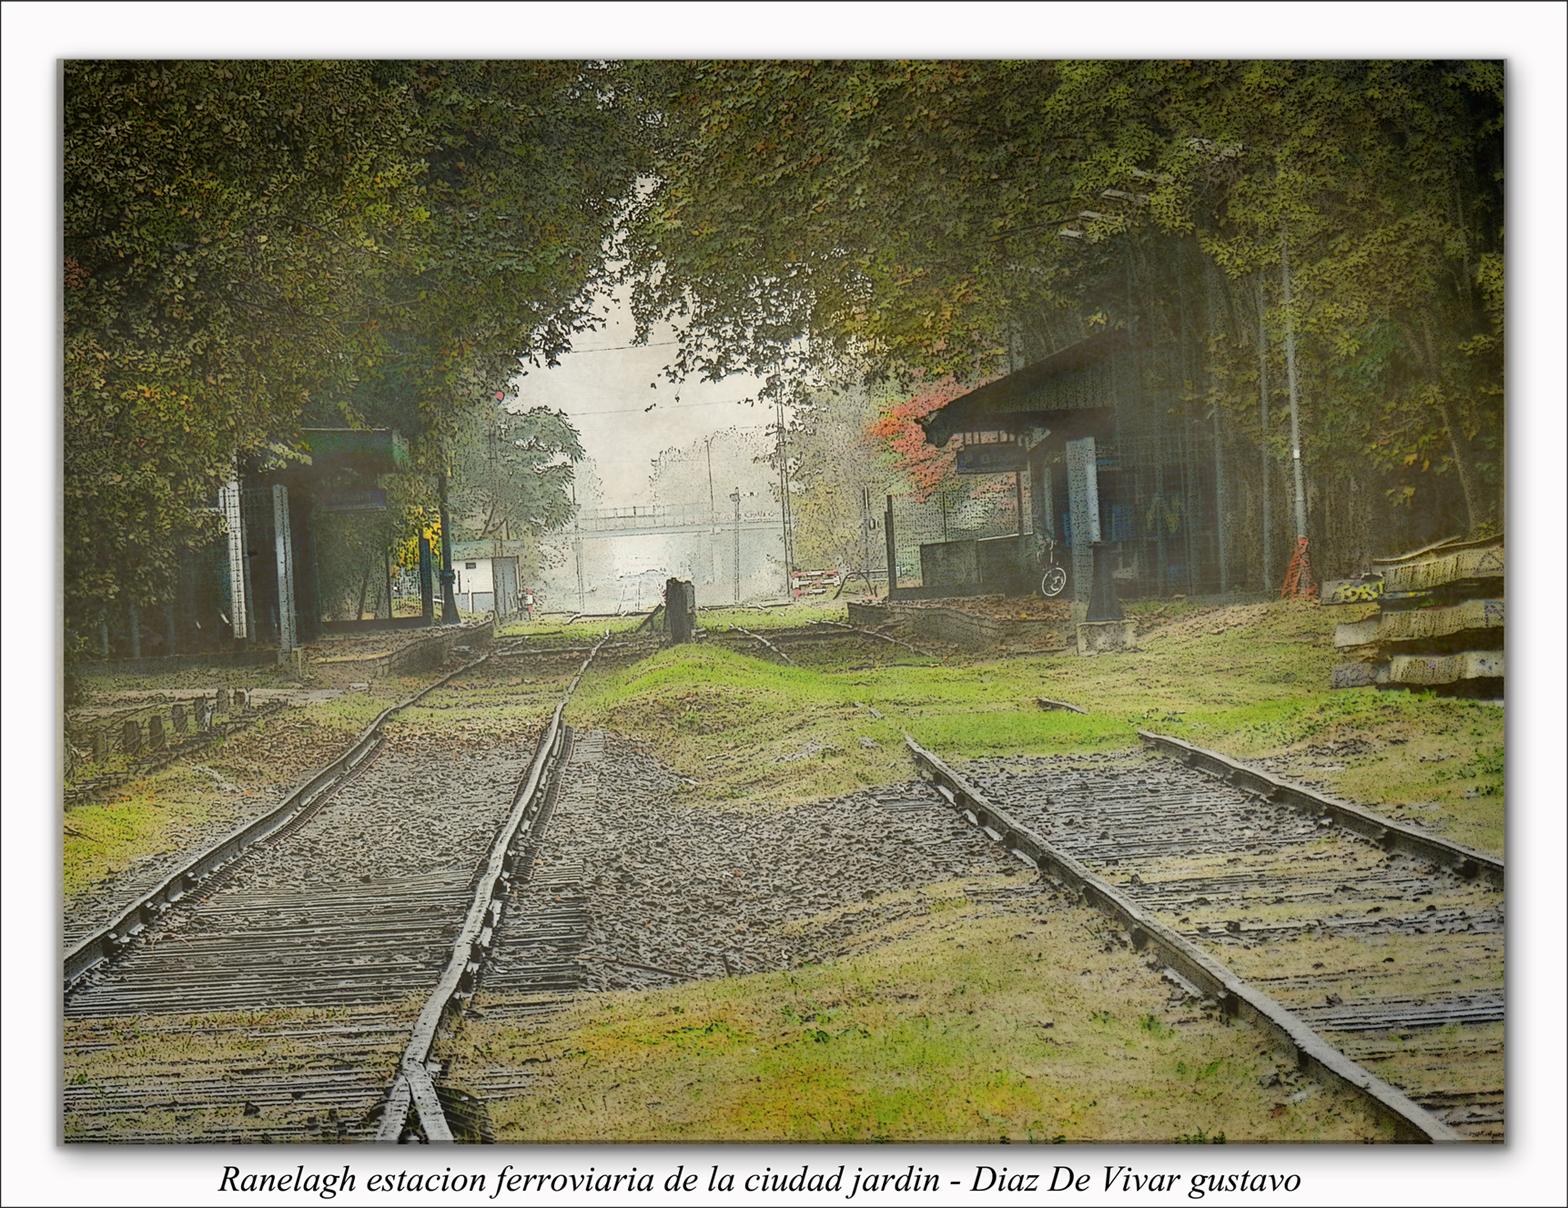 Ranelagh Estacion ferroviaria de la ciudad Jardin  - Diaz De Vivar Gustavo